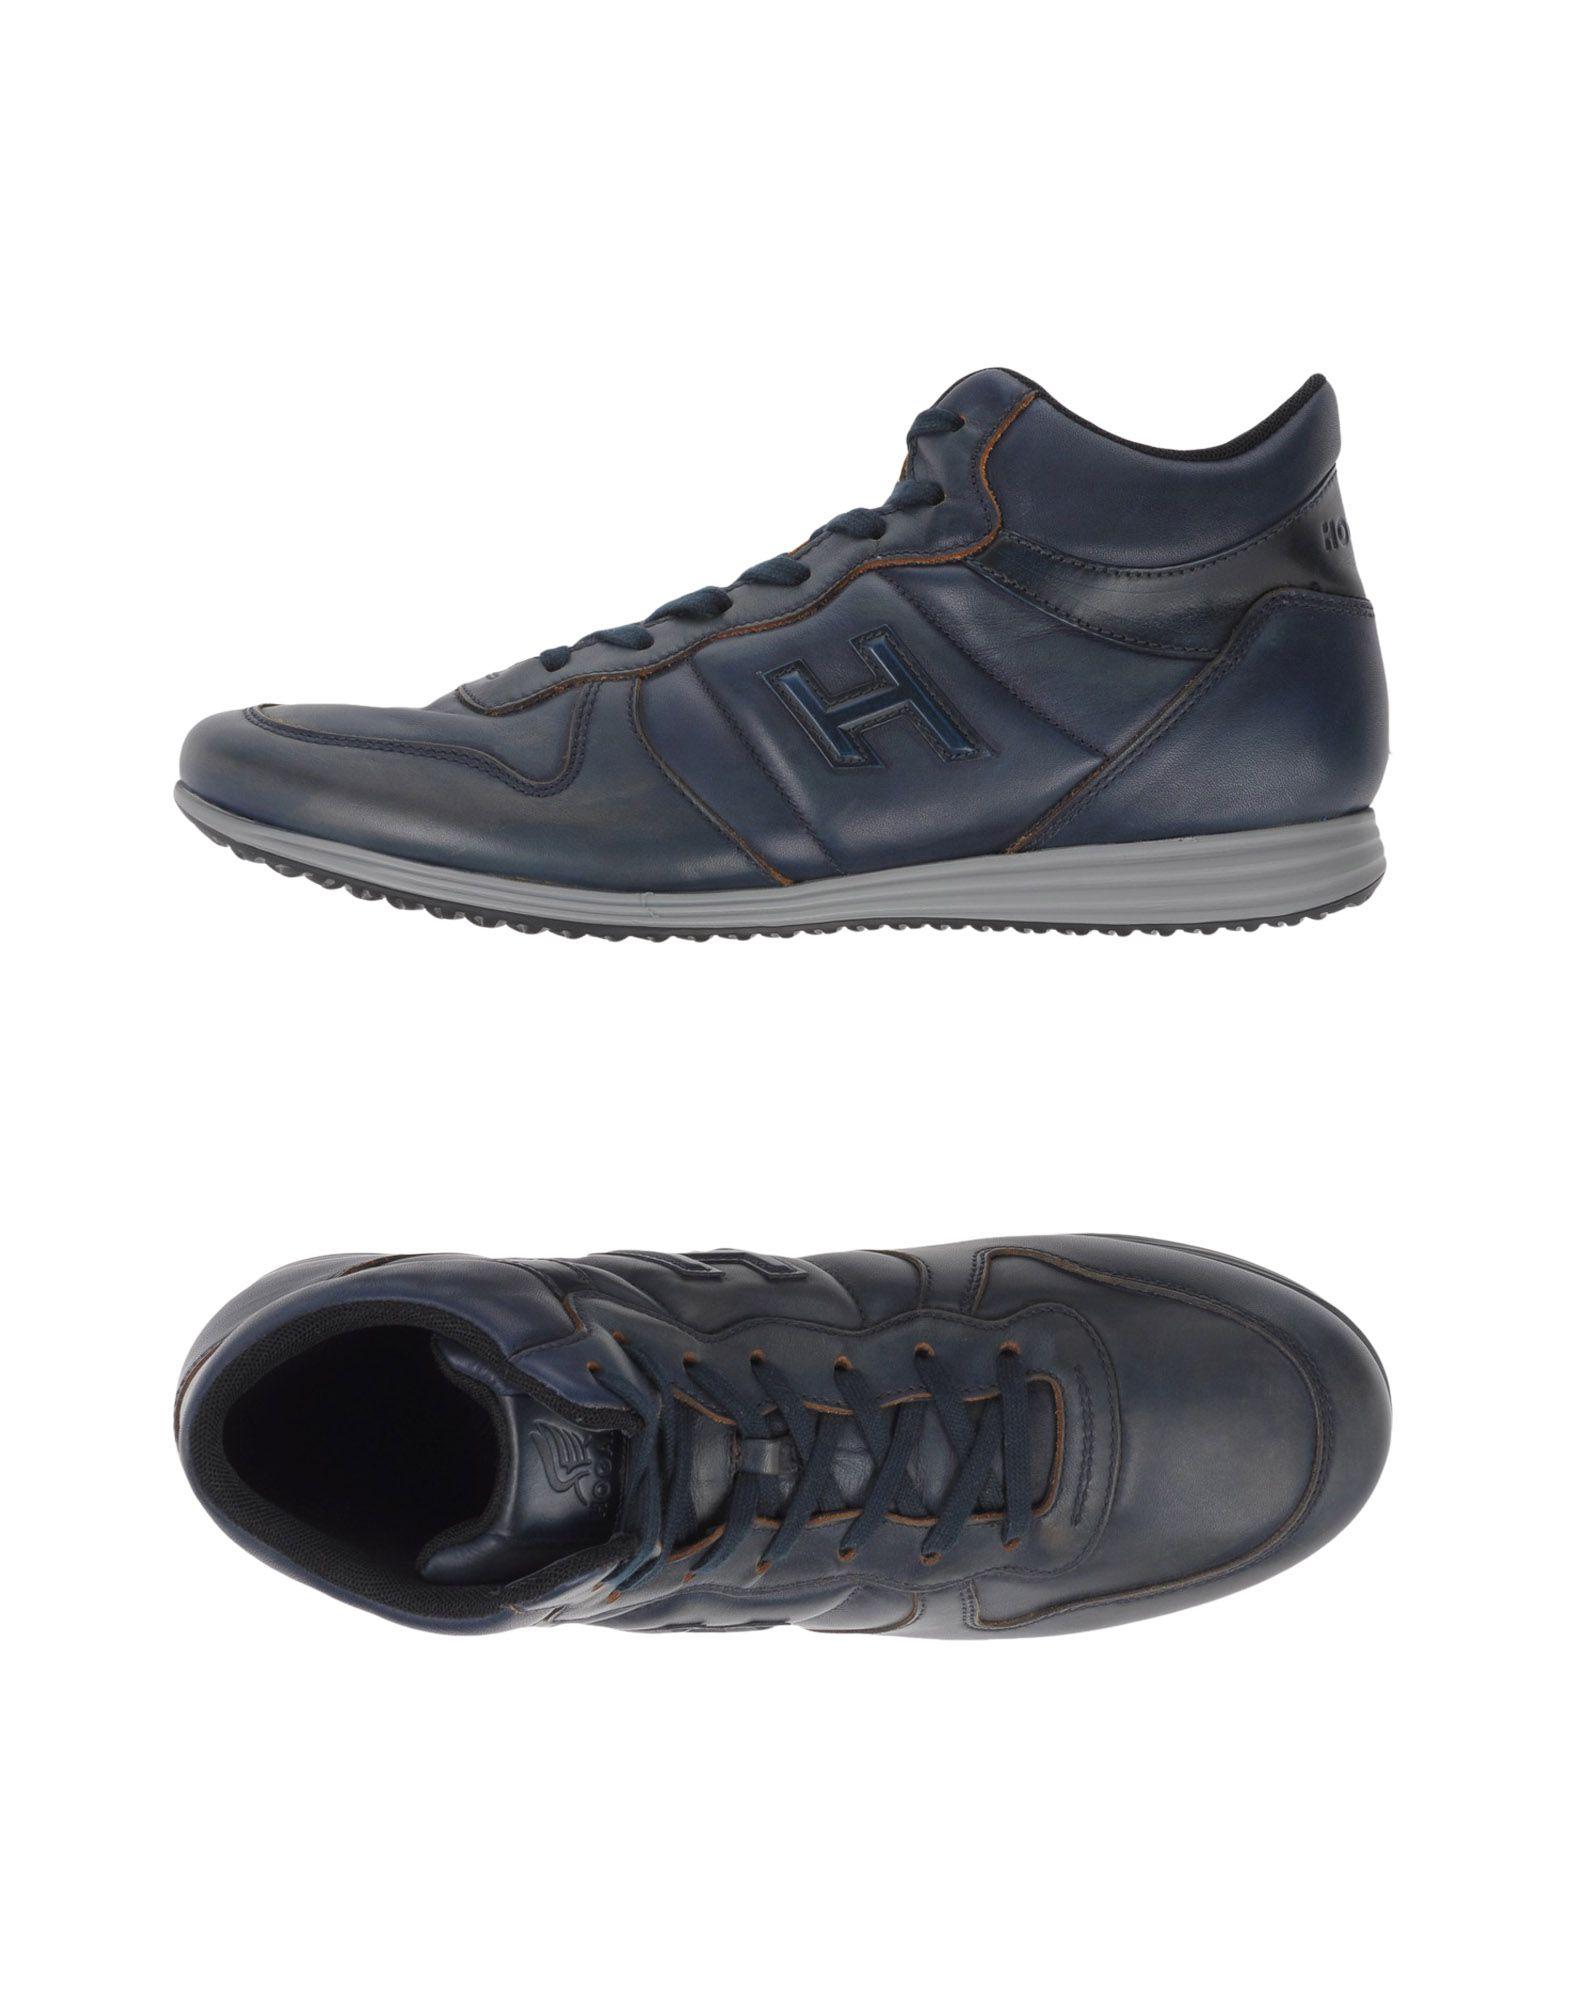 Hogan Sneakers Herren Qualität  11072831PK Gute Qualität Herren beliebte Schuhe a9c806